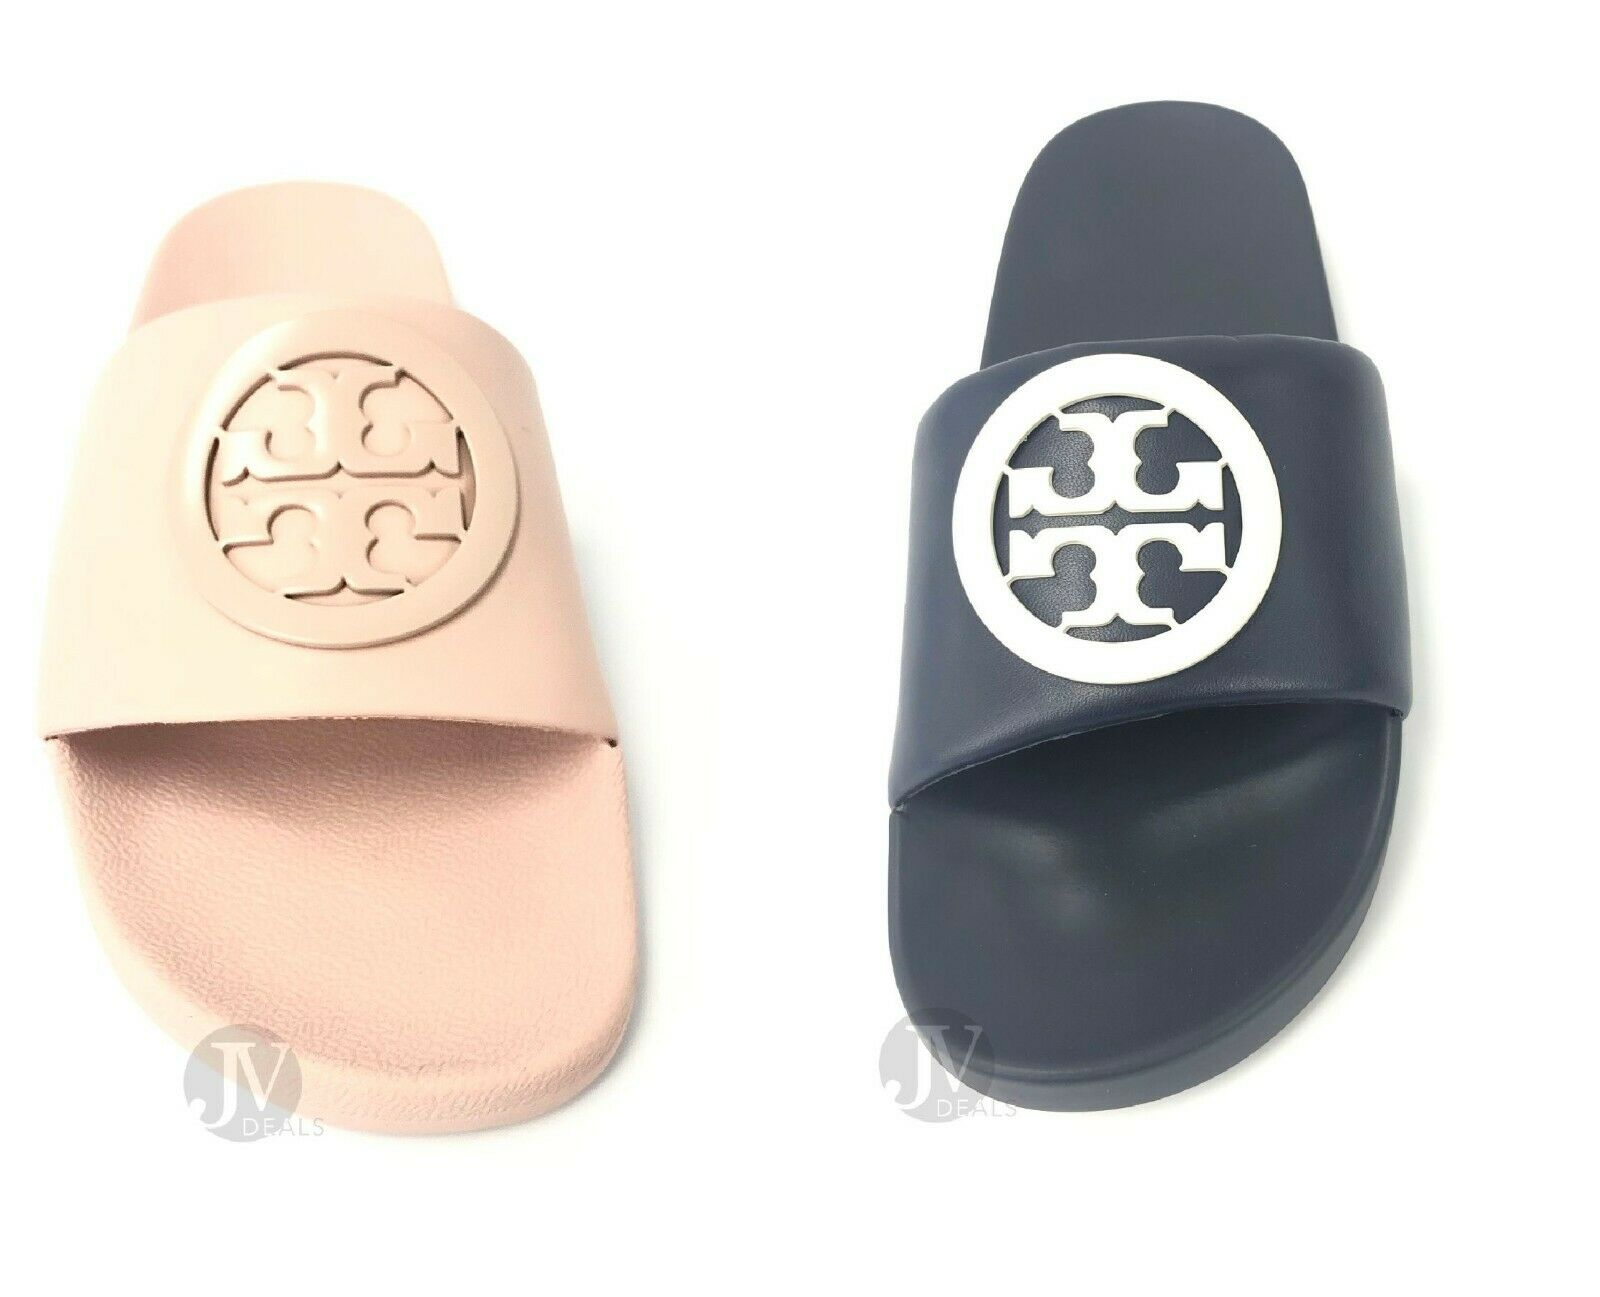 Tory Burch Lina Slide Nappa Leather Logo Sandals Shoes